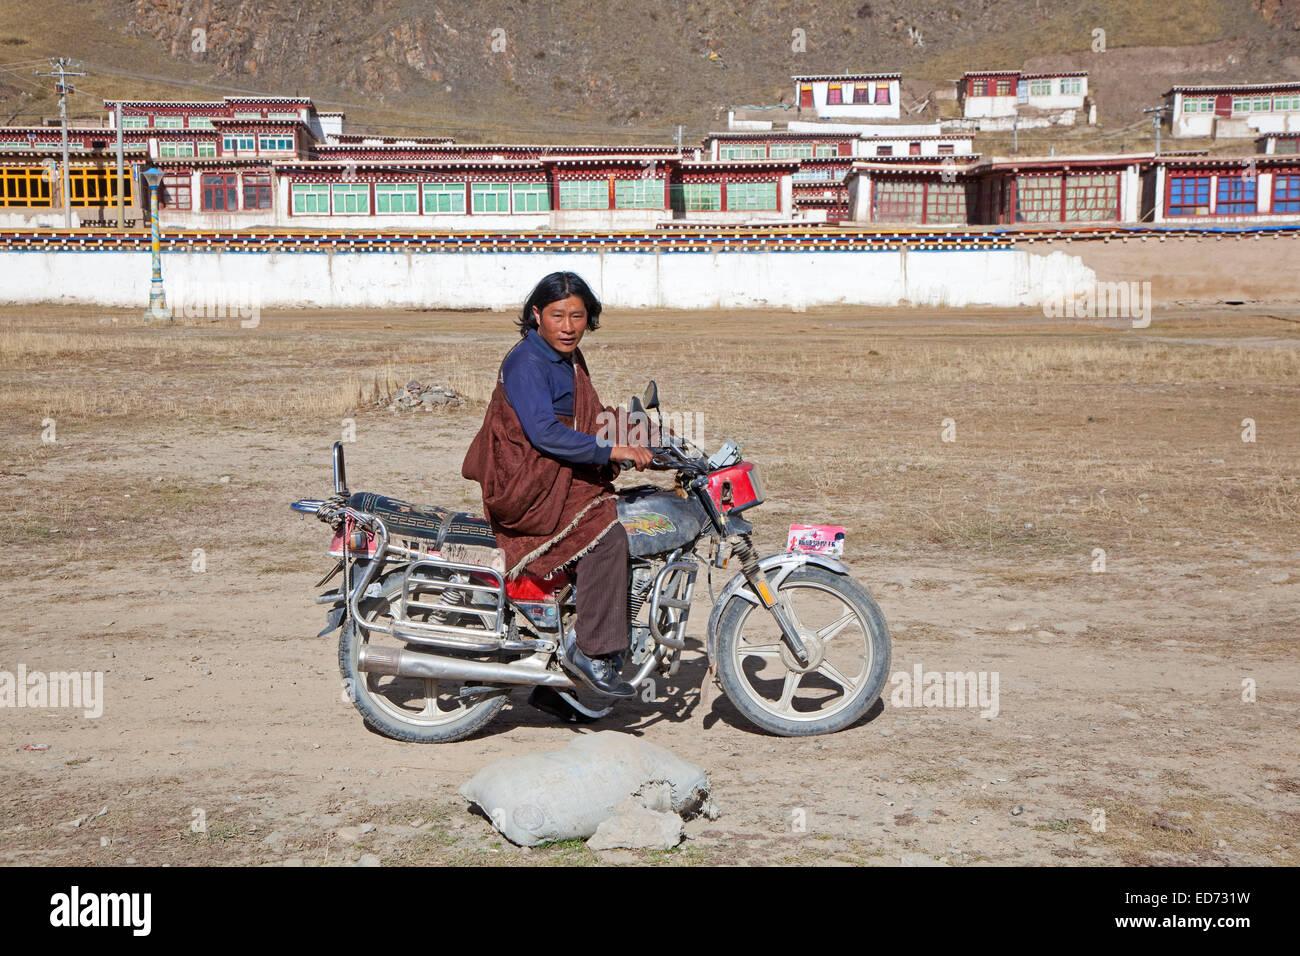 Tibetan man riding motorbike in front of monastery between Sershu Dzong and Sershu / Serxu, Sichuan Province, China - Stock Image